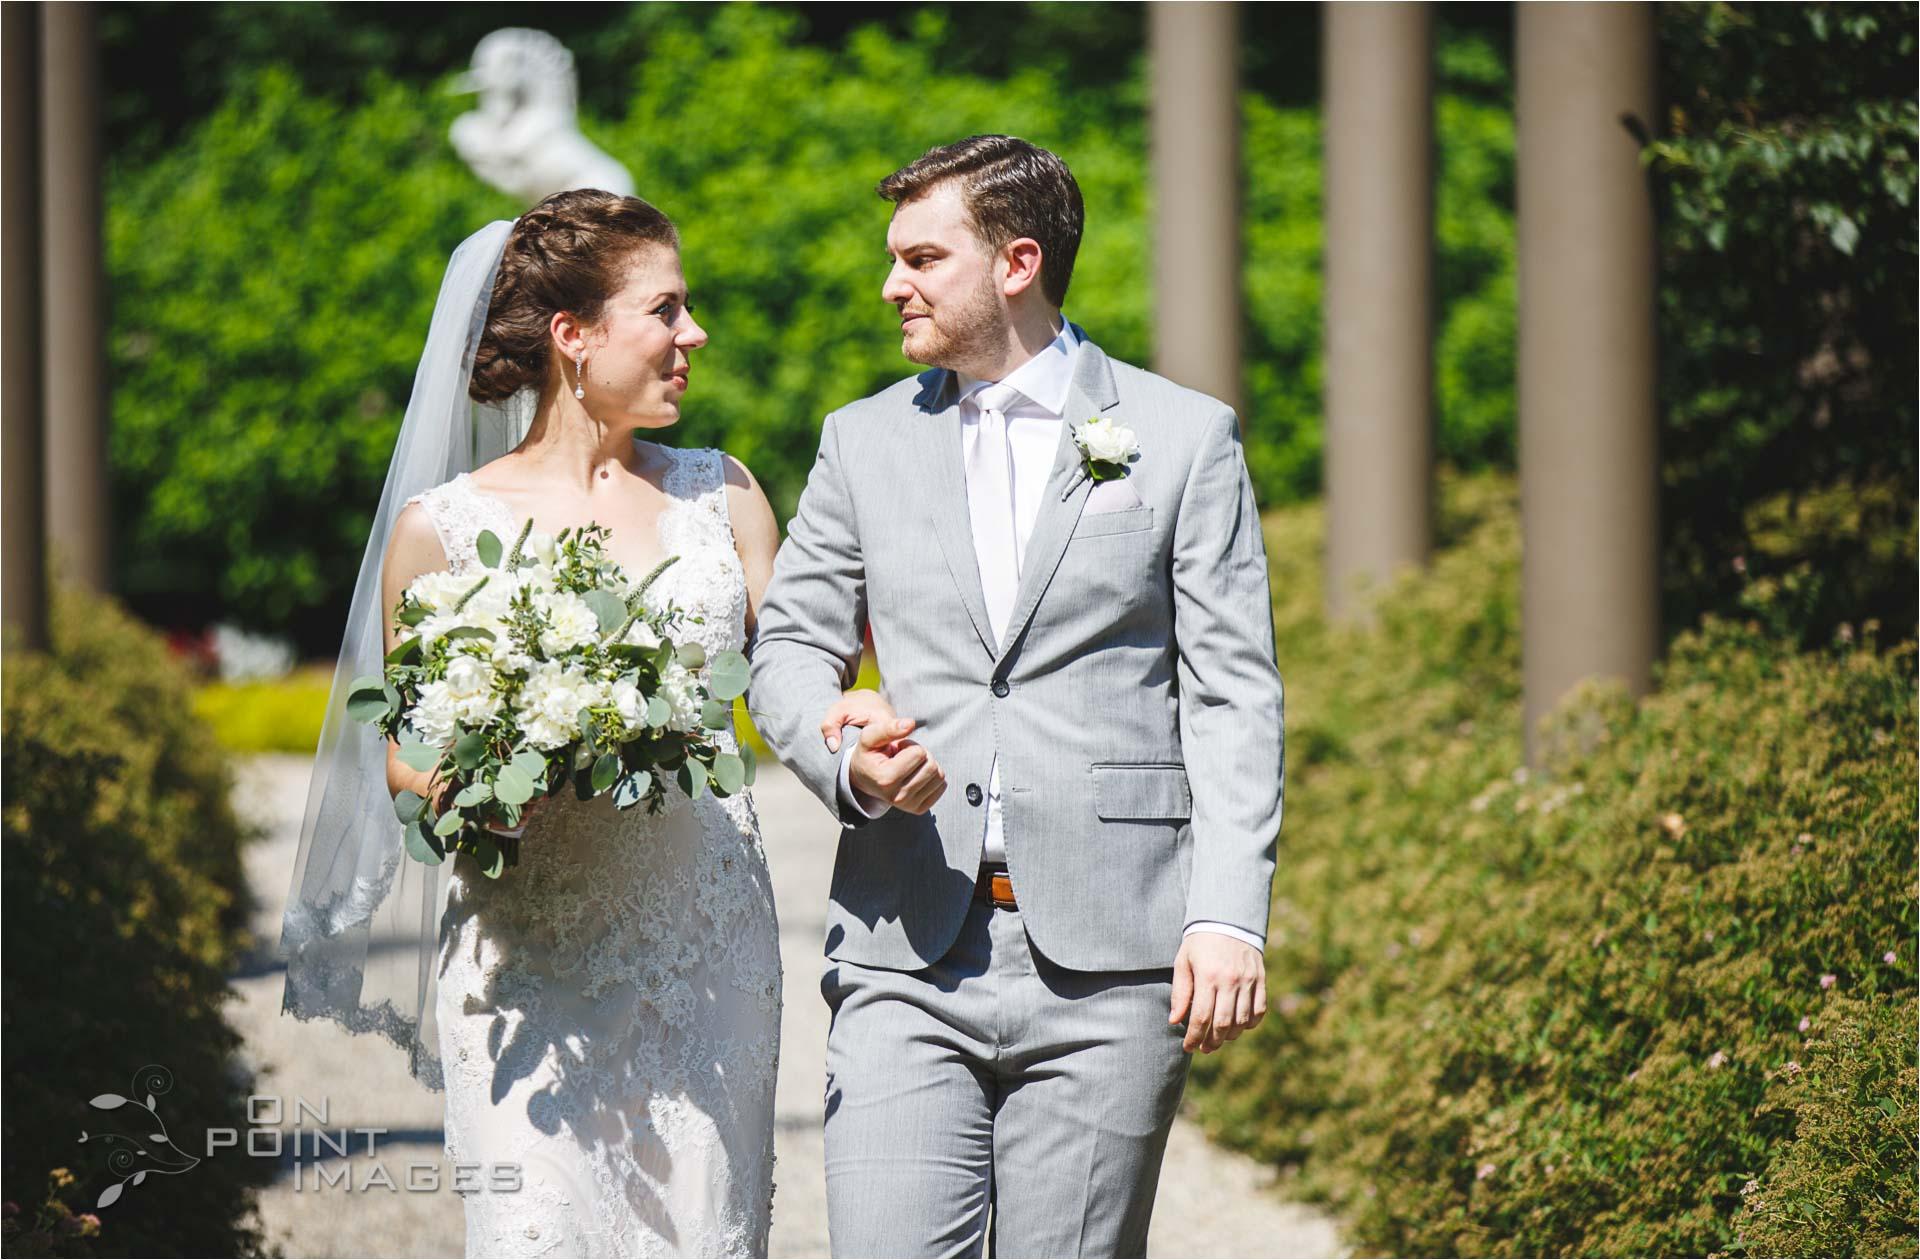 wickham-park-wedding-photographer-ct-12.jpg